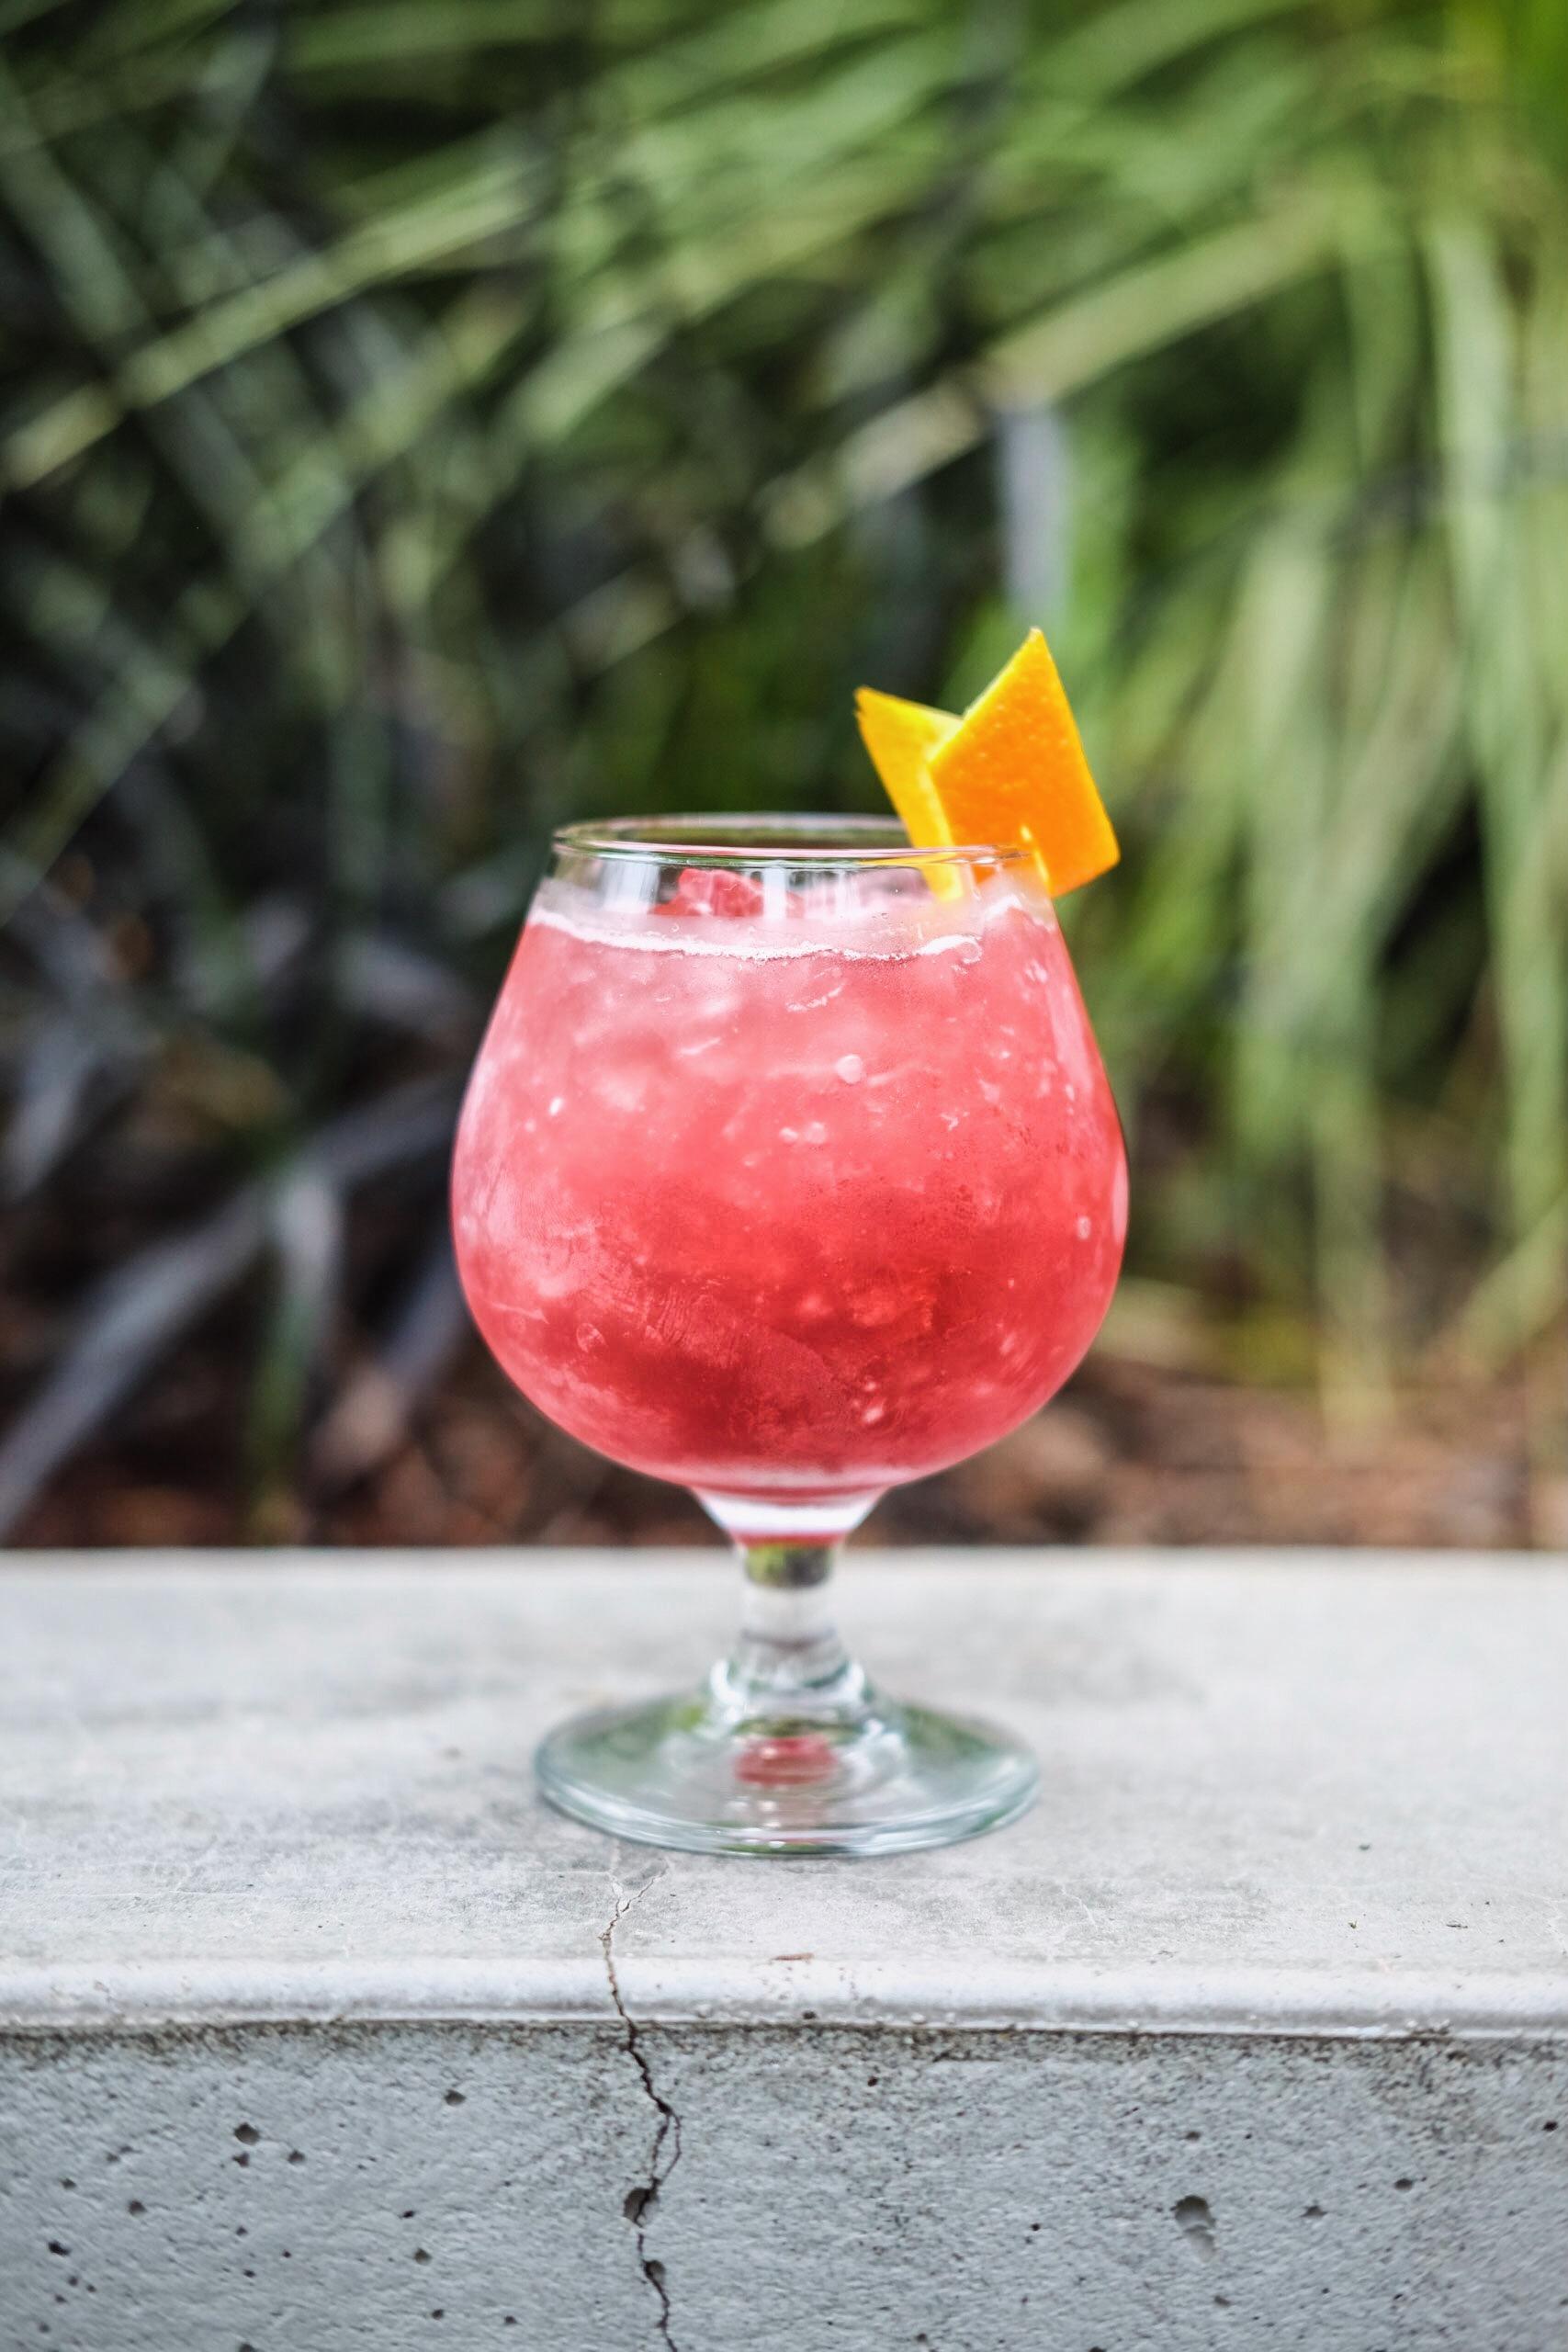 Pacific Sunset - 1oz Cranberry-infused vodka1oz apple brandy¾ oz fresh orange juice½ oz cinnamon syrupsplash of soda